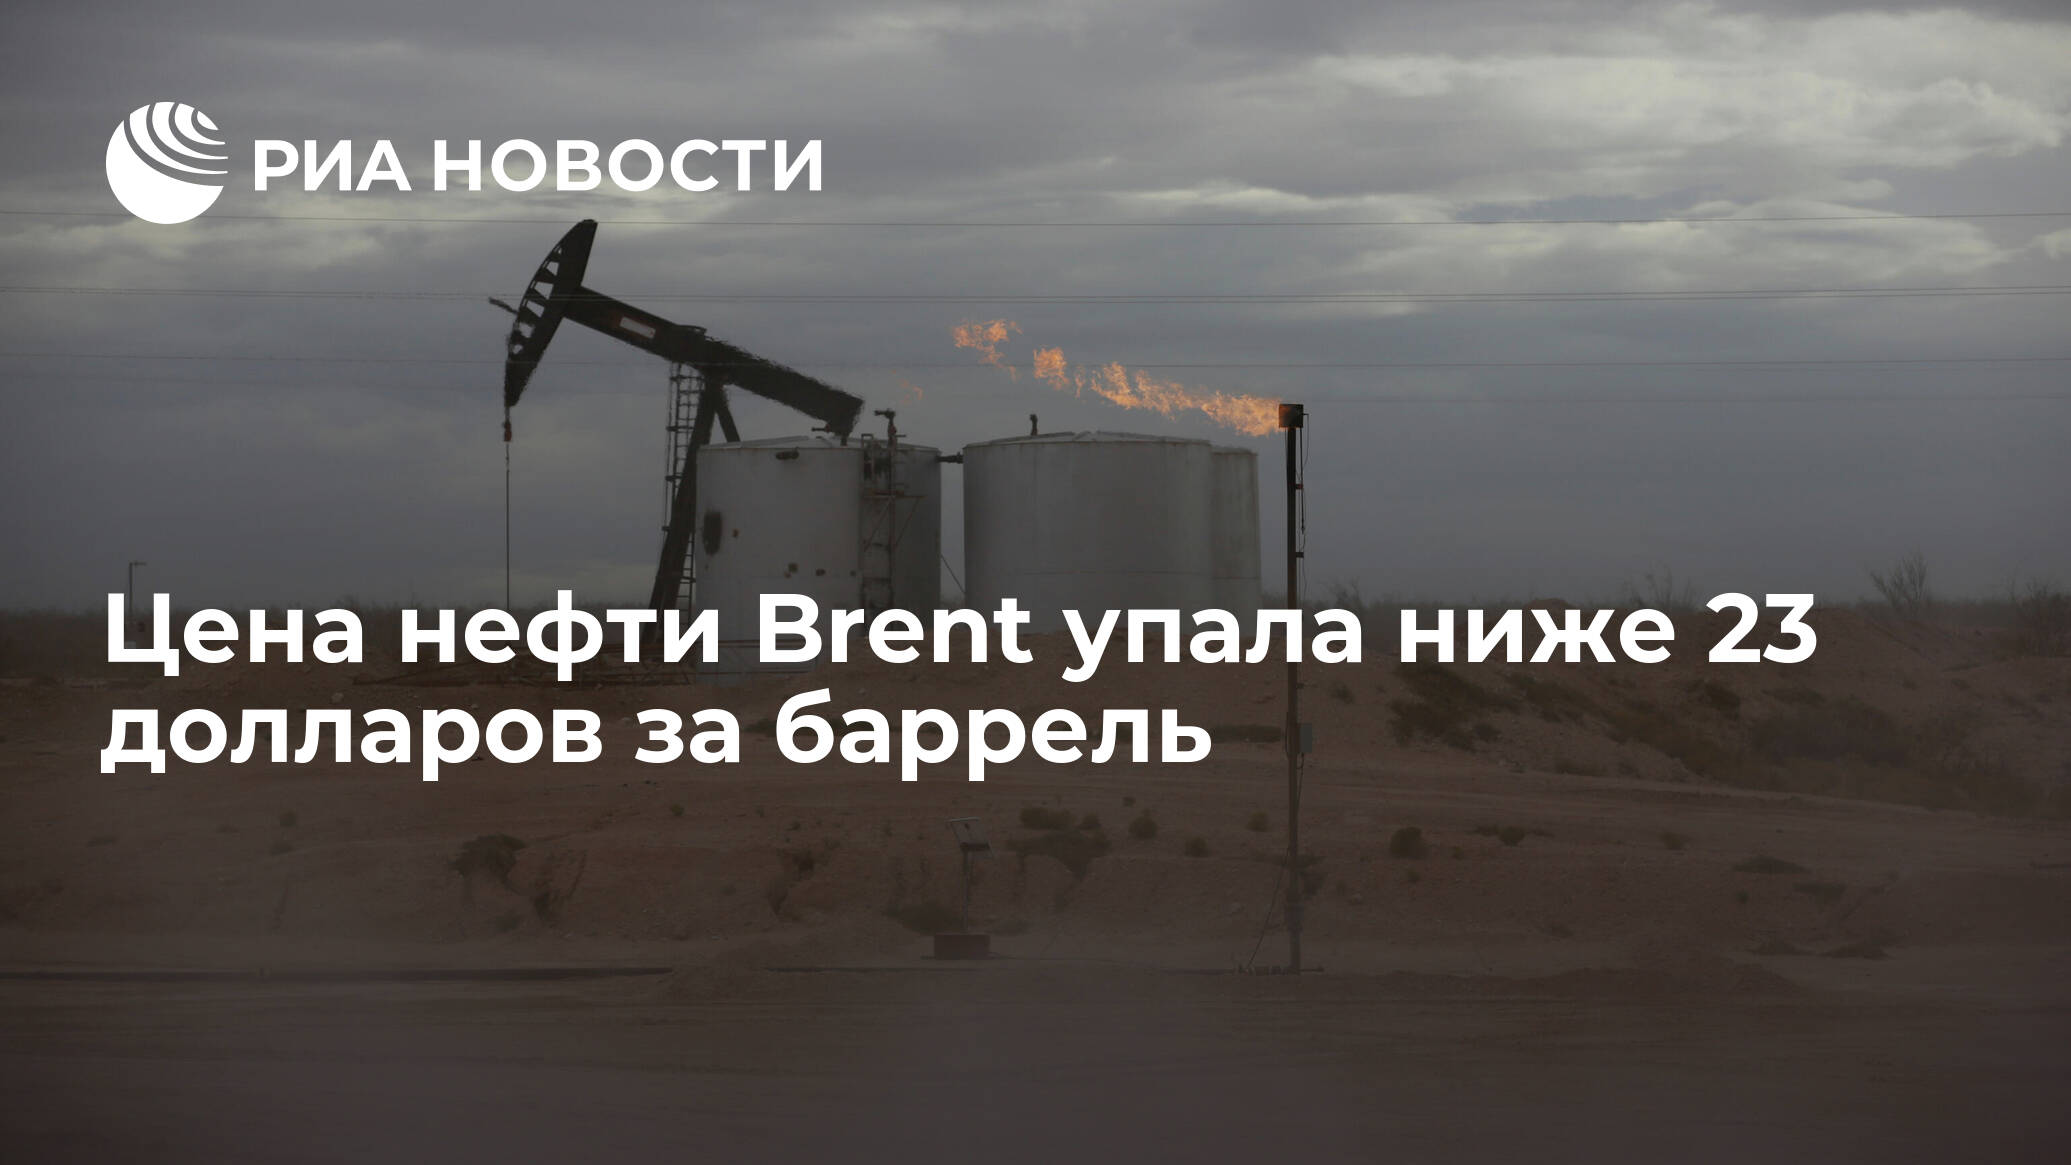 Цена нефти Brent упала ниже 23 долларов за баррель